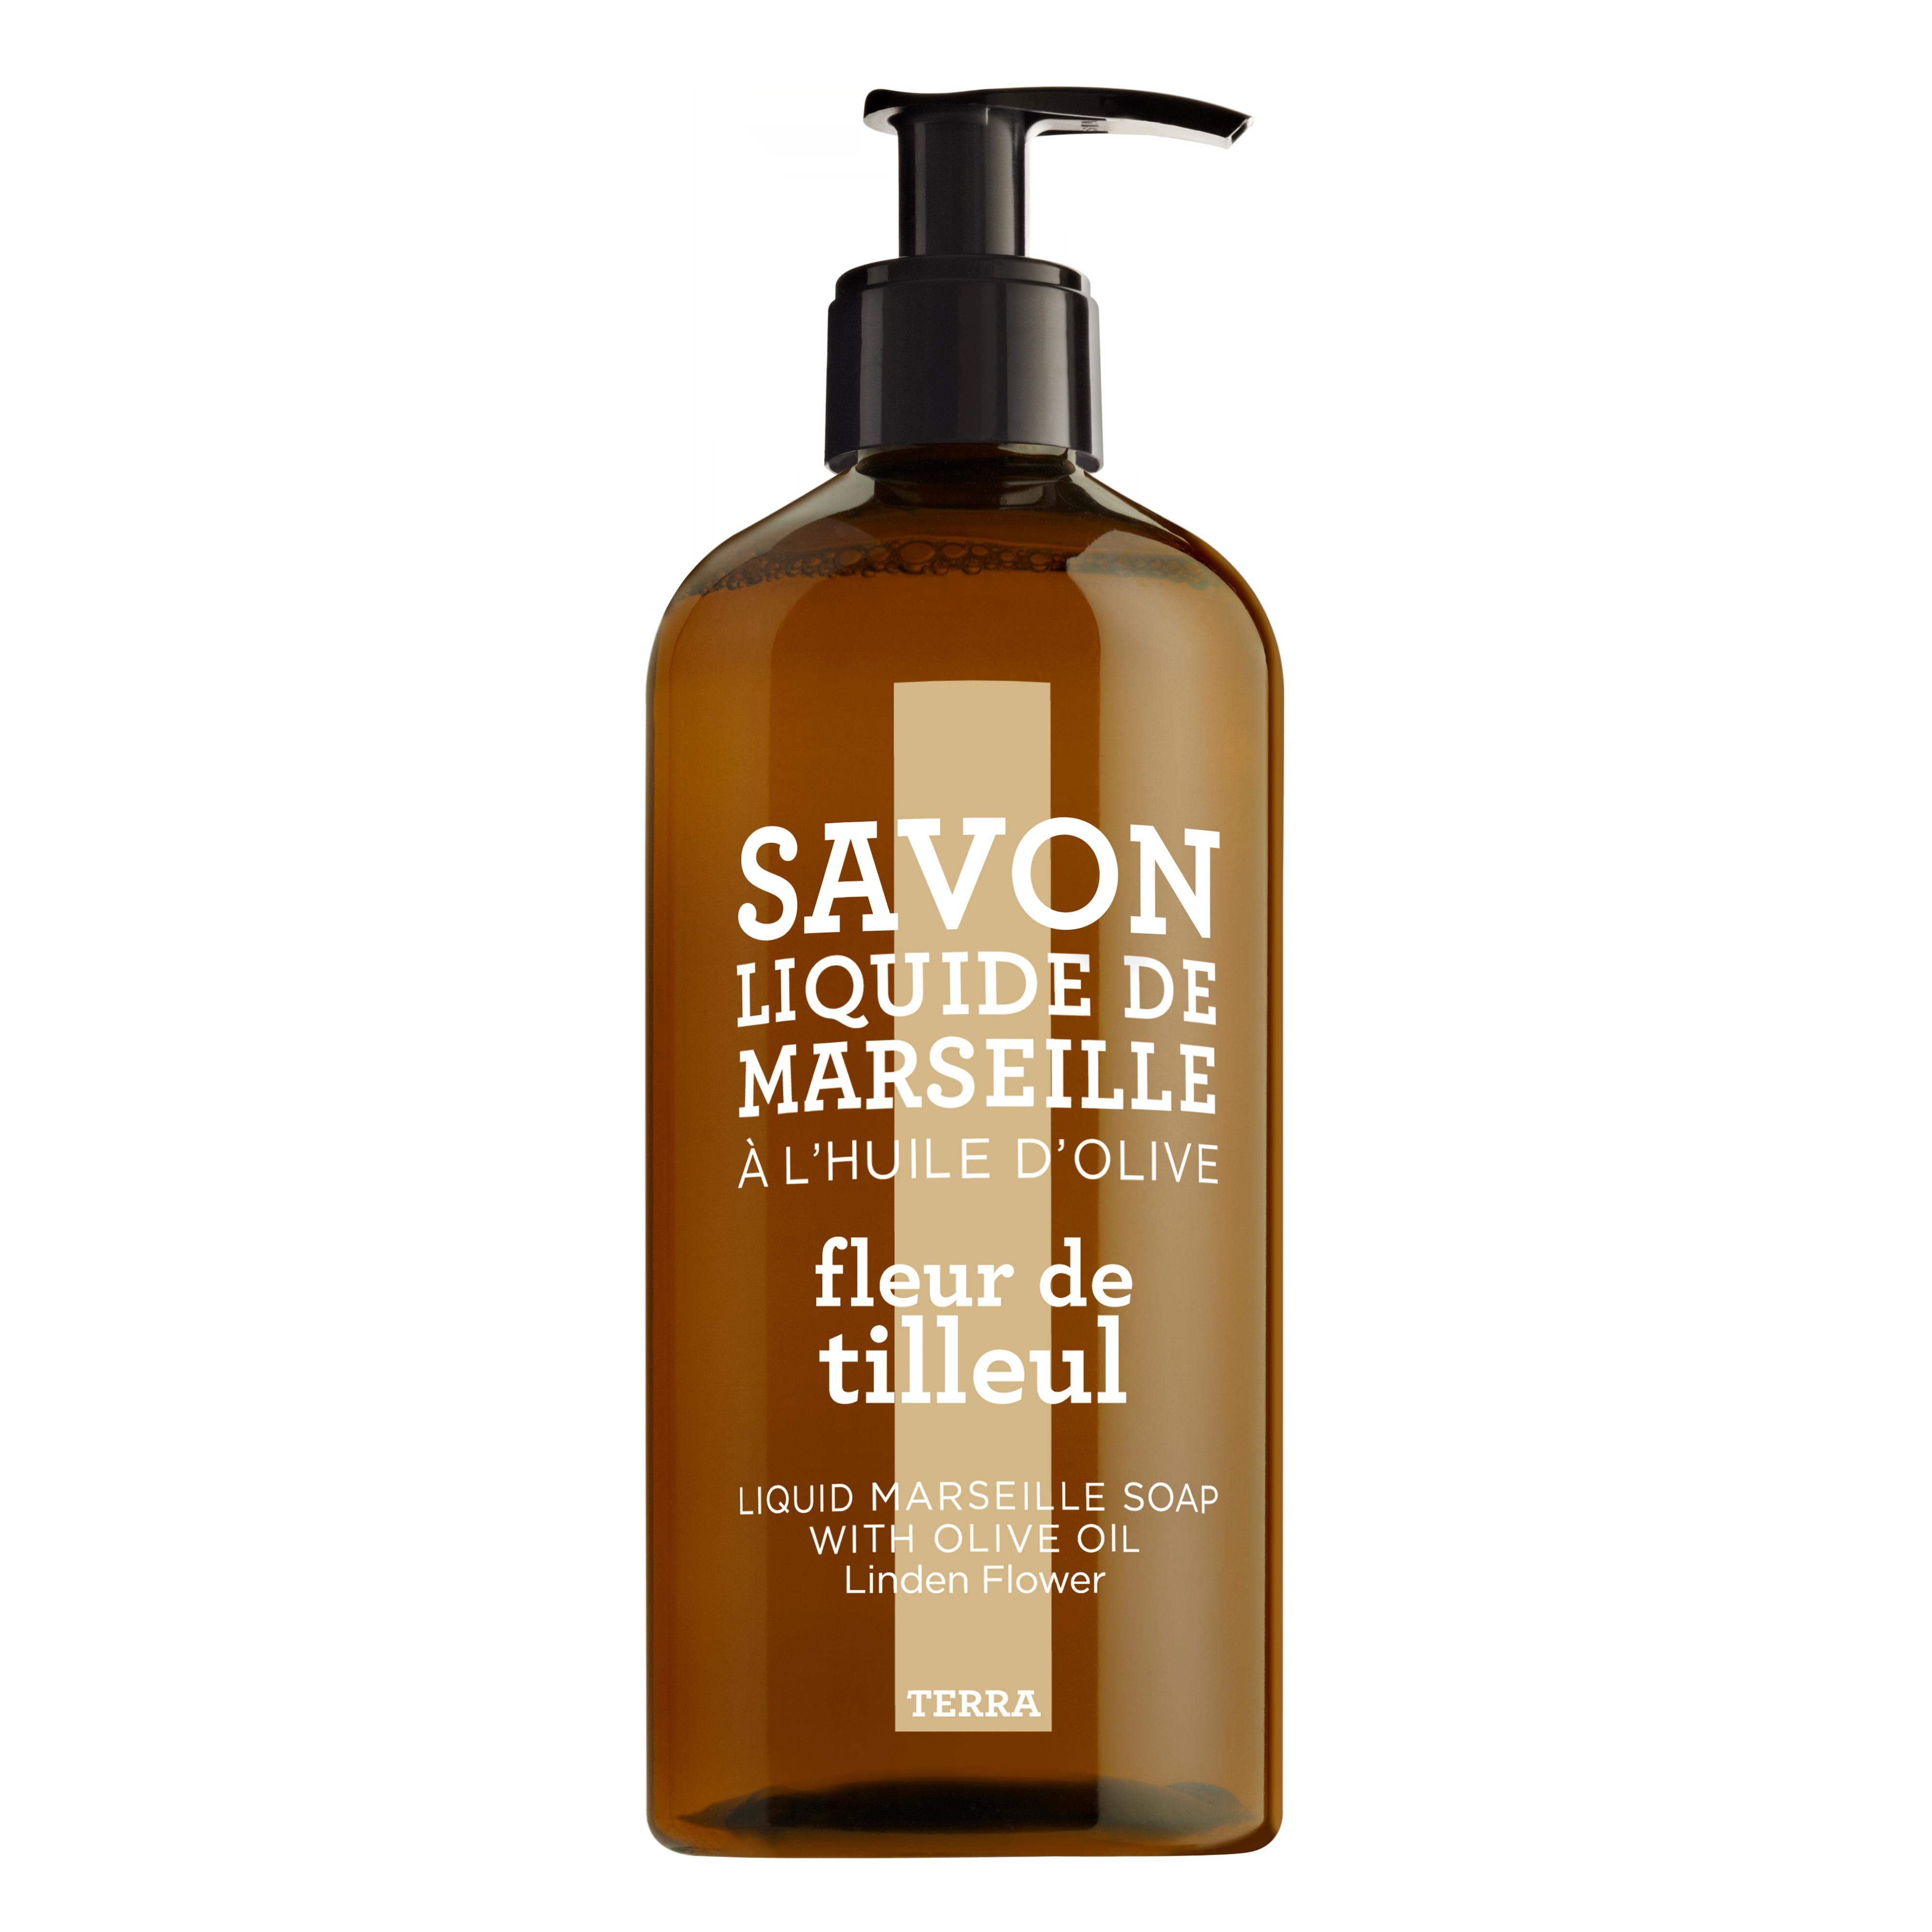 Linden Flower Liquid Soap